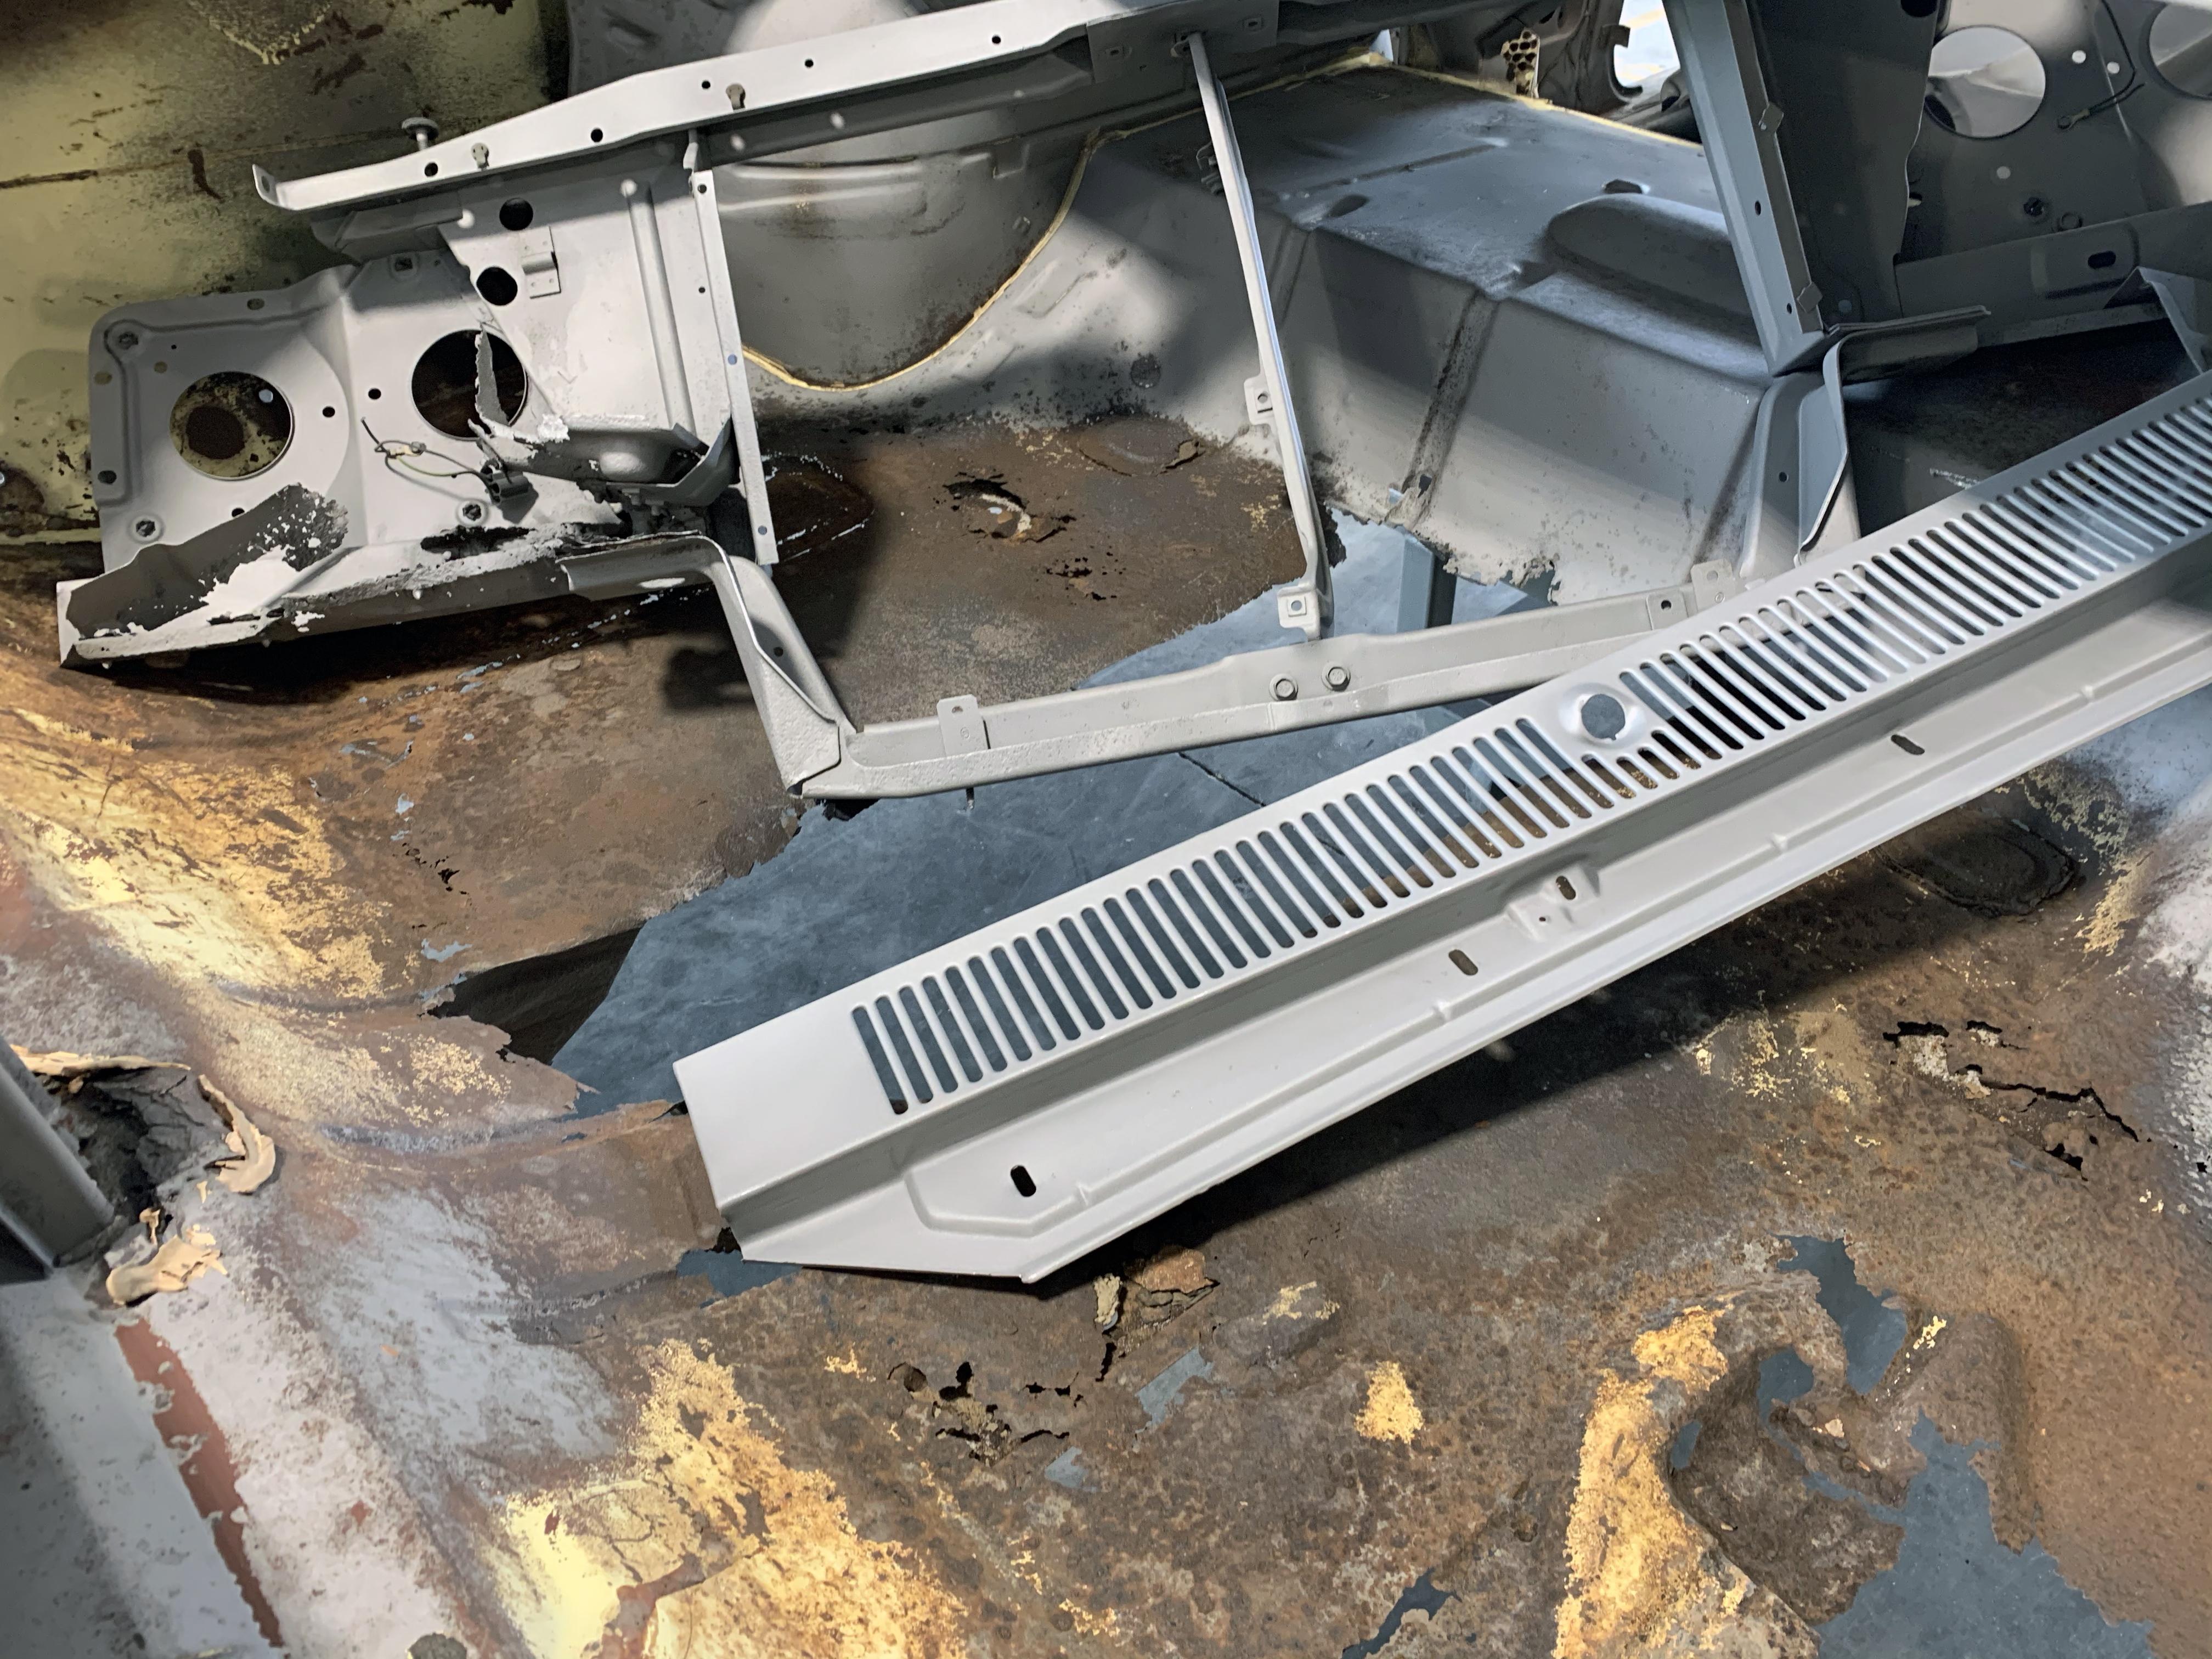 scotts-hotrods-65-cutlass-project-18